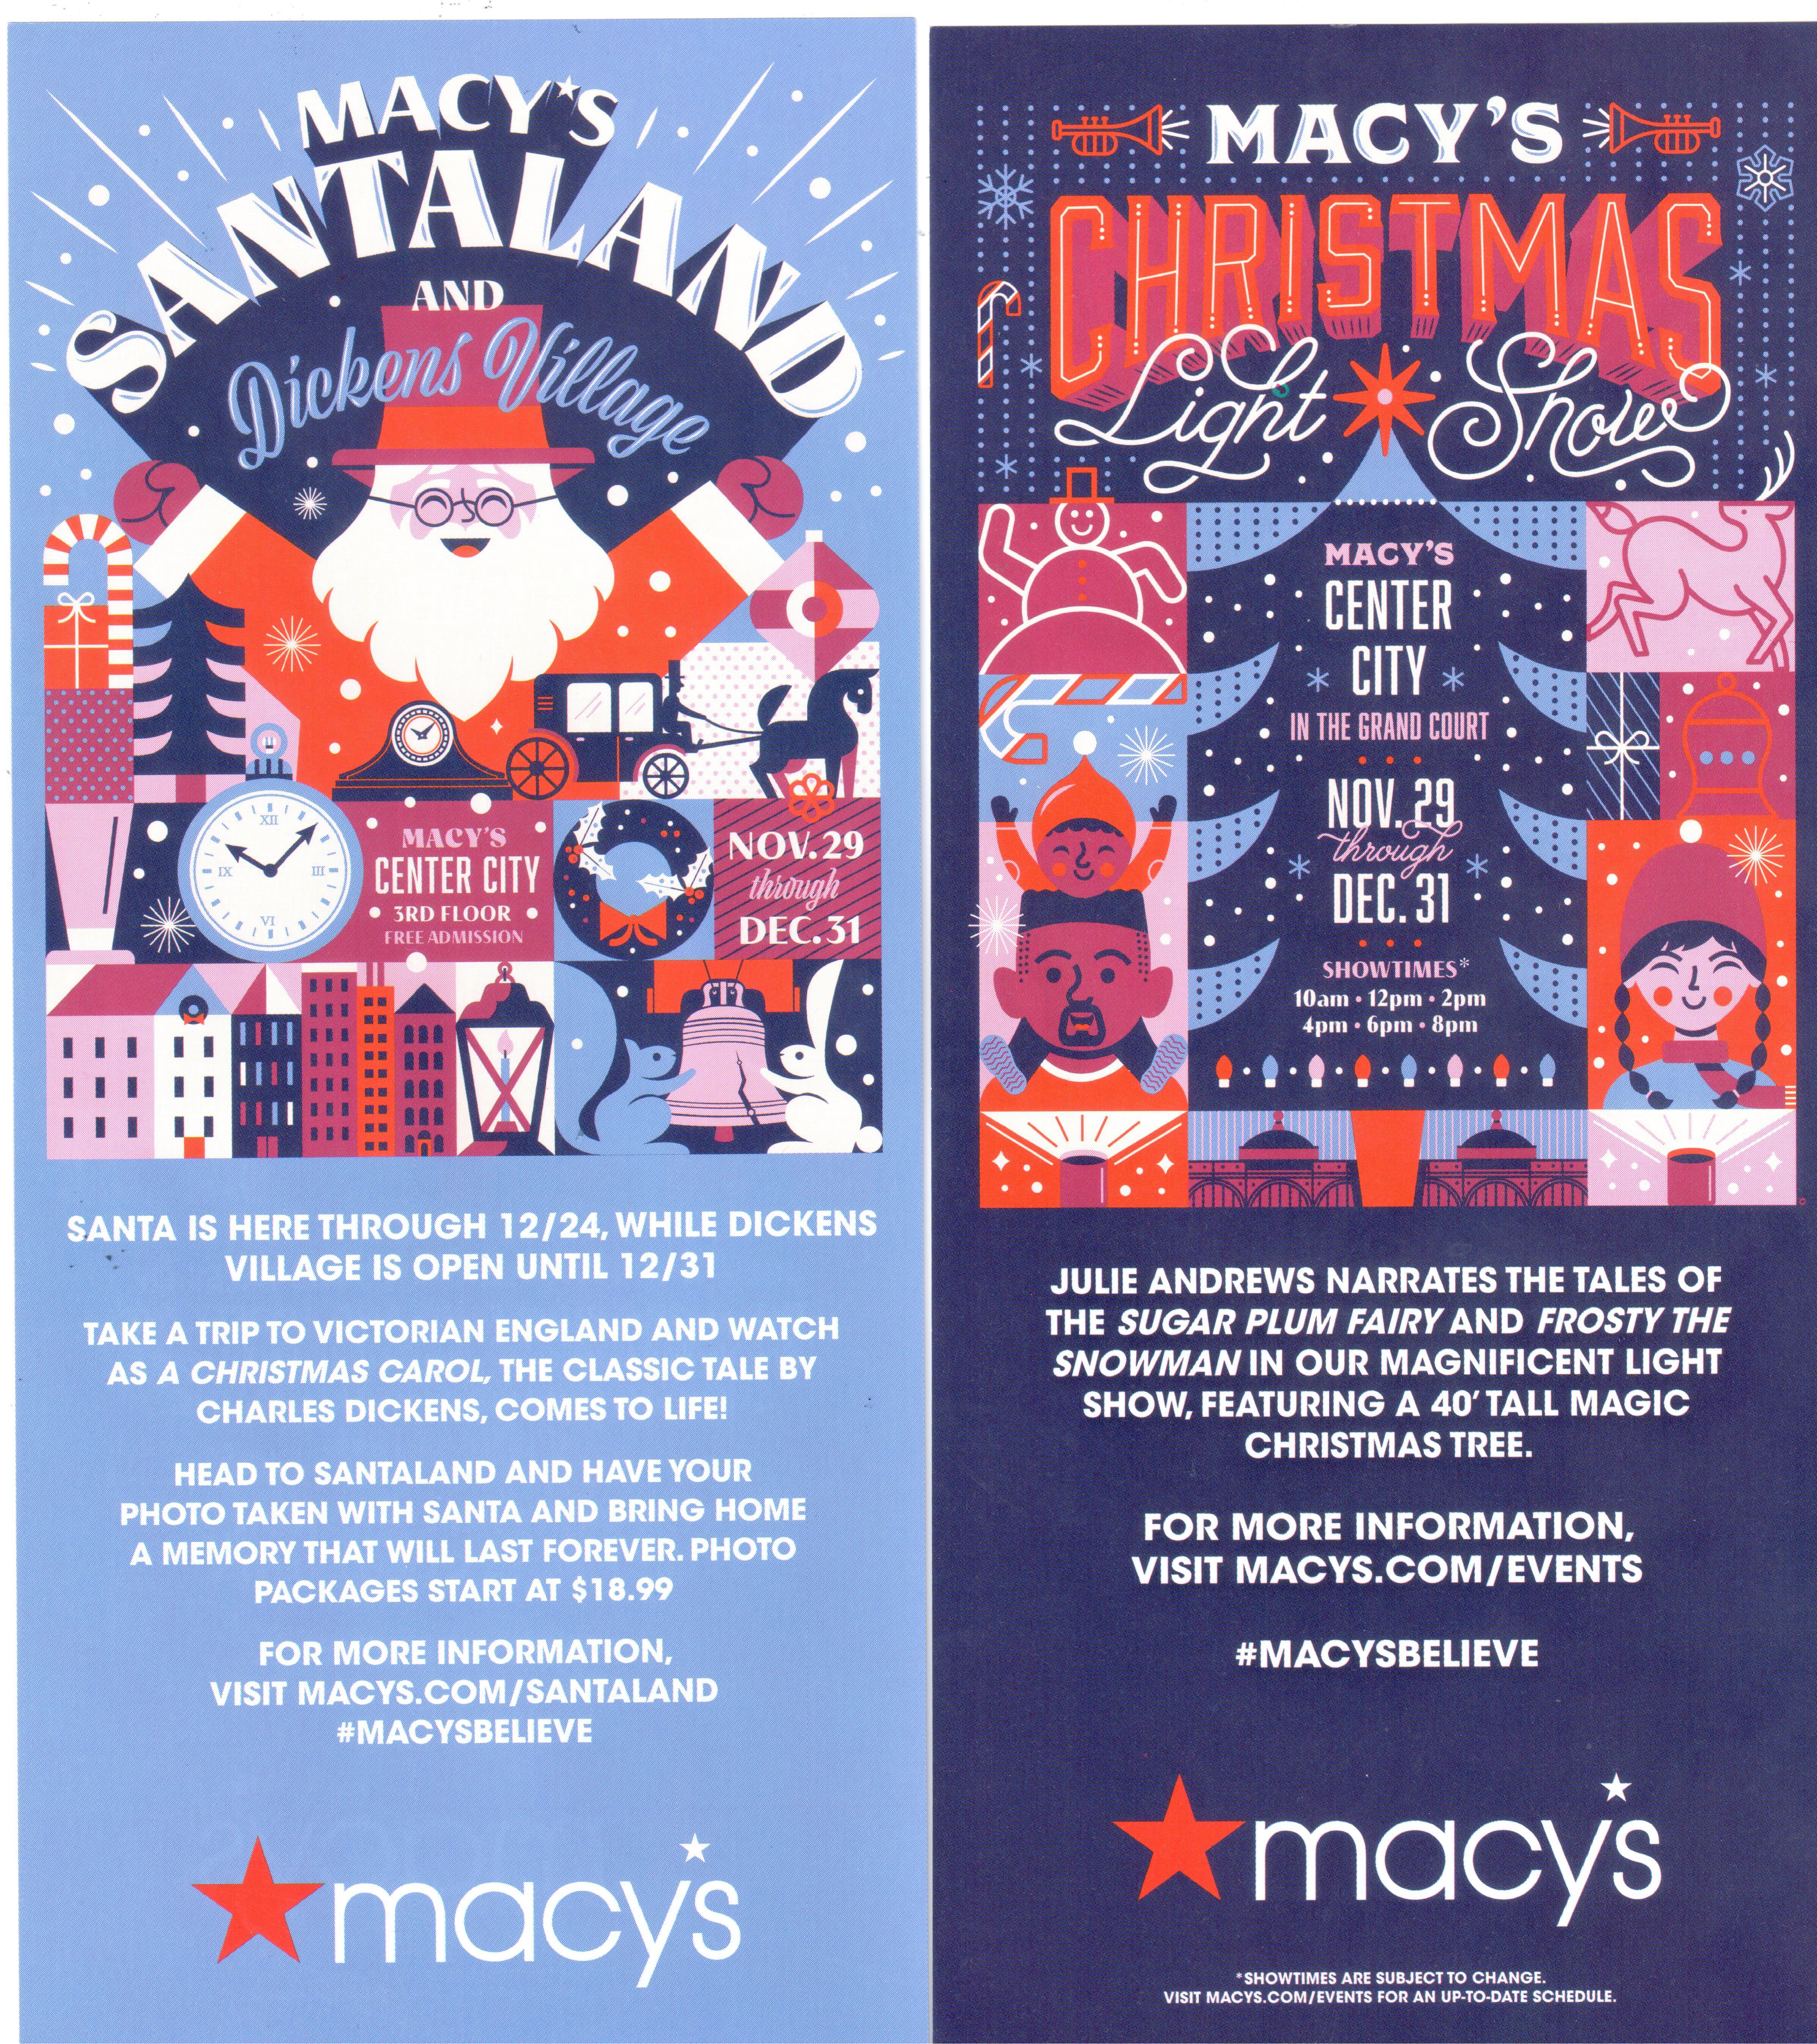 Christmas Light Show at Macy's Philadelphia – Friends of Wanamaker